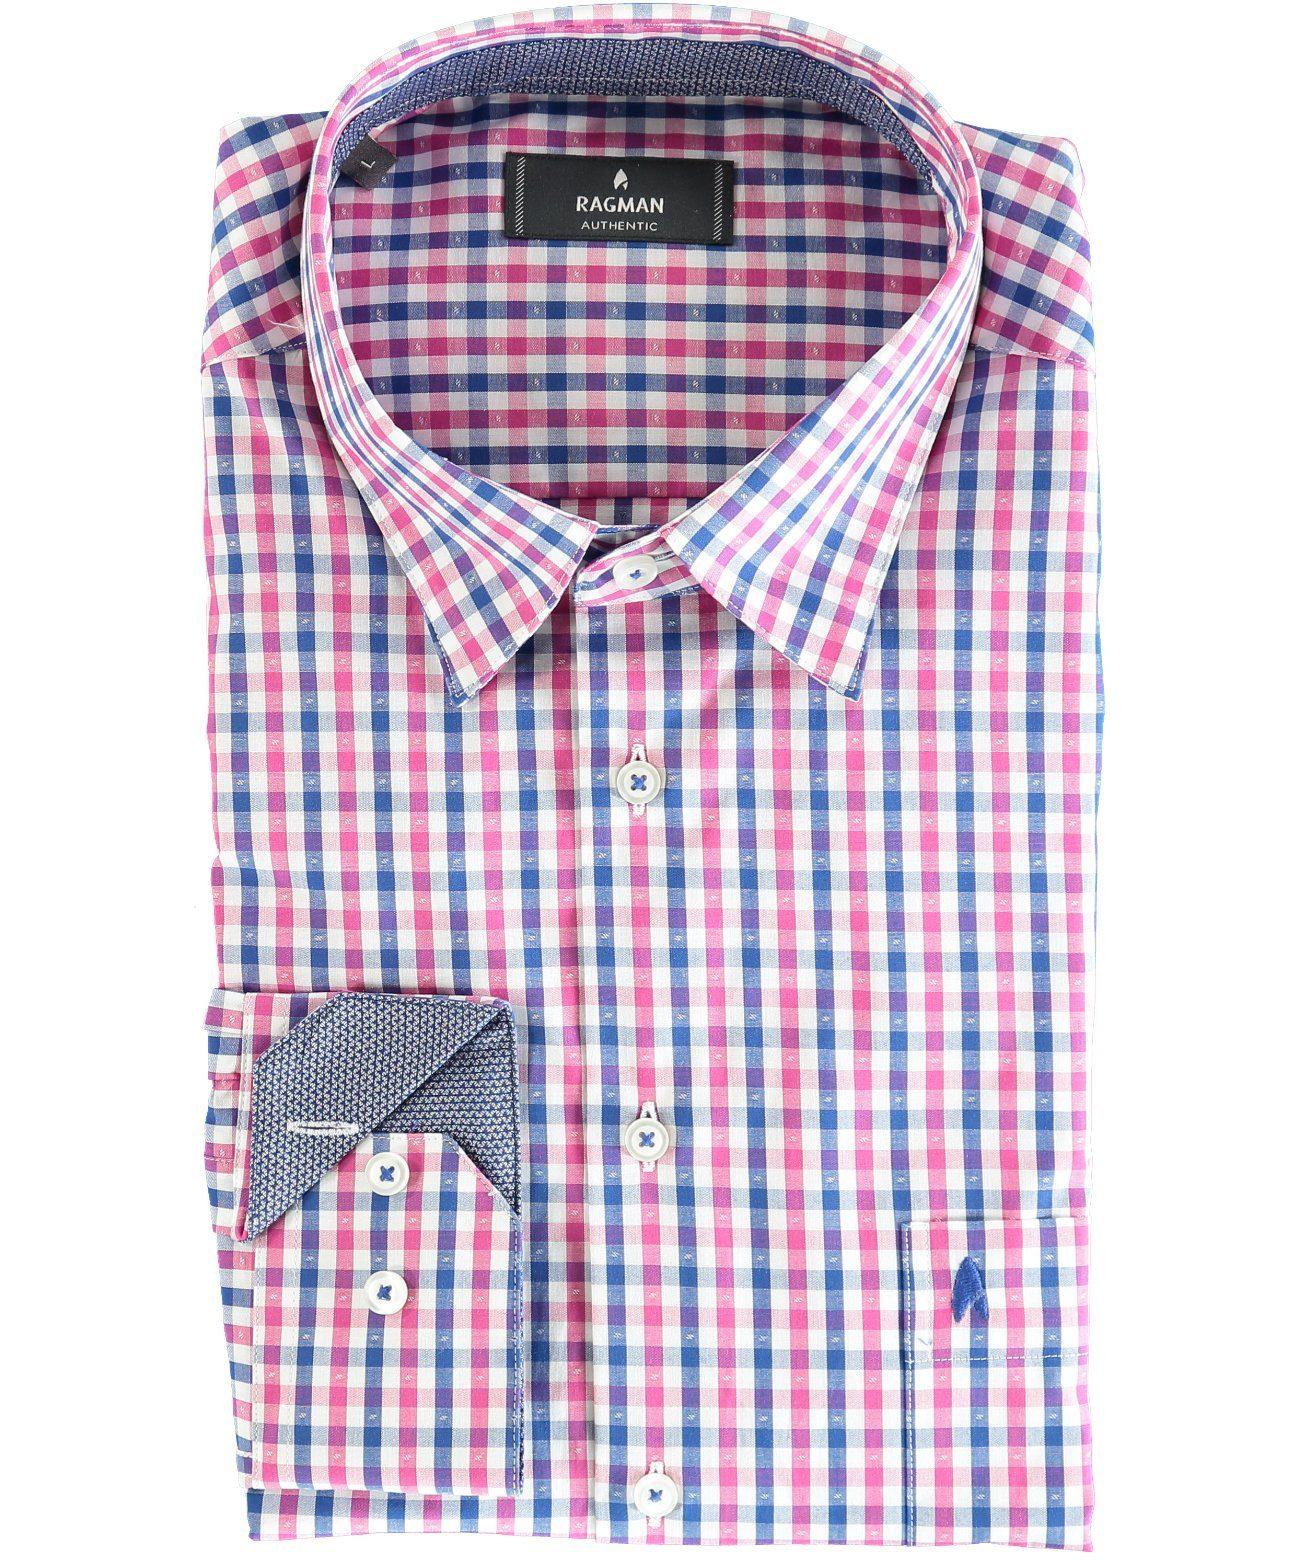 RAGMAN Henleyshirt | Bekleidung > Hemden > Freizeithemden | Rot | RAGMAN